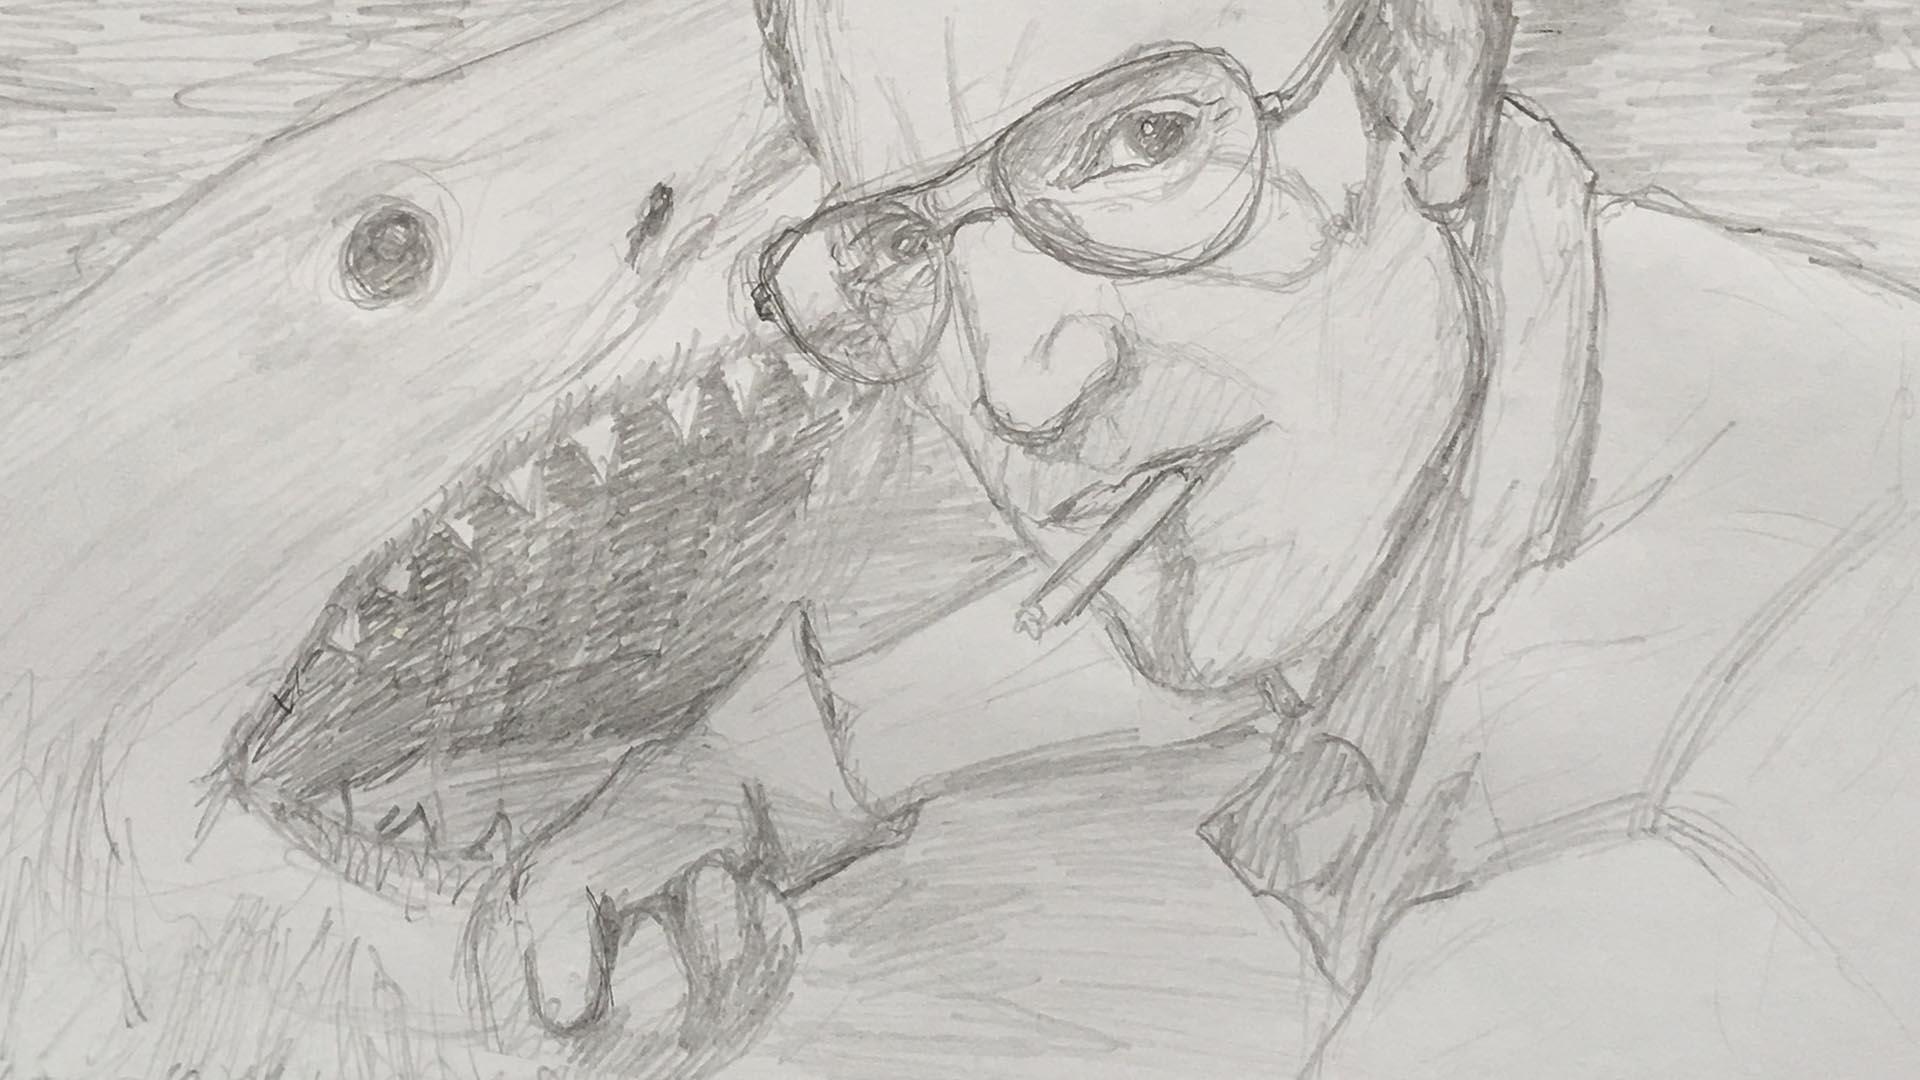 Roy Scheider a Pencil Drawing 0